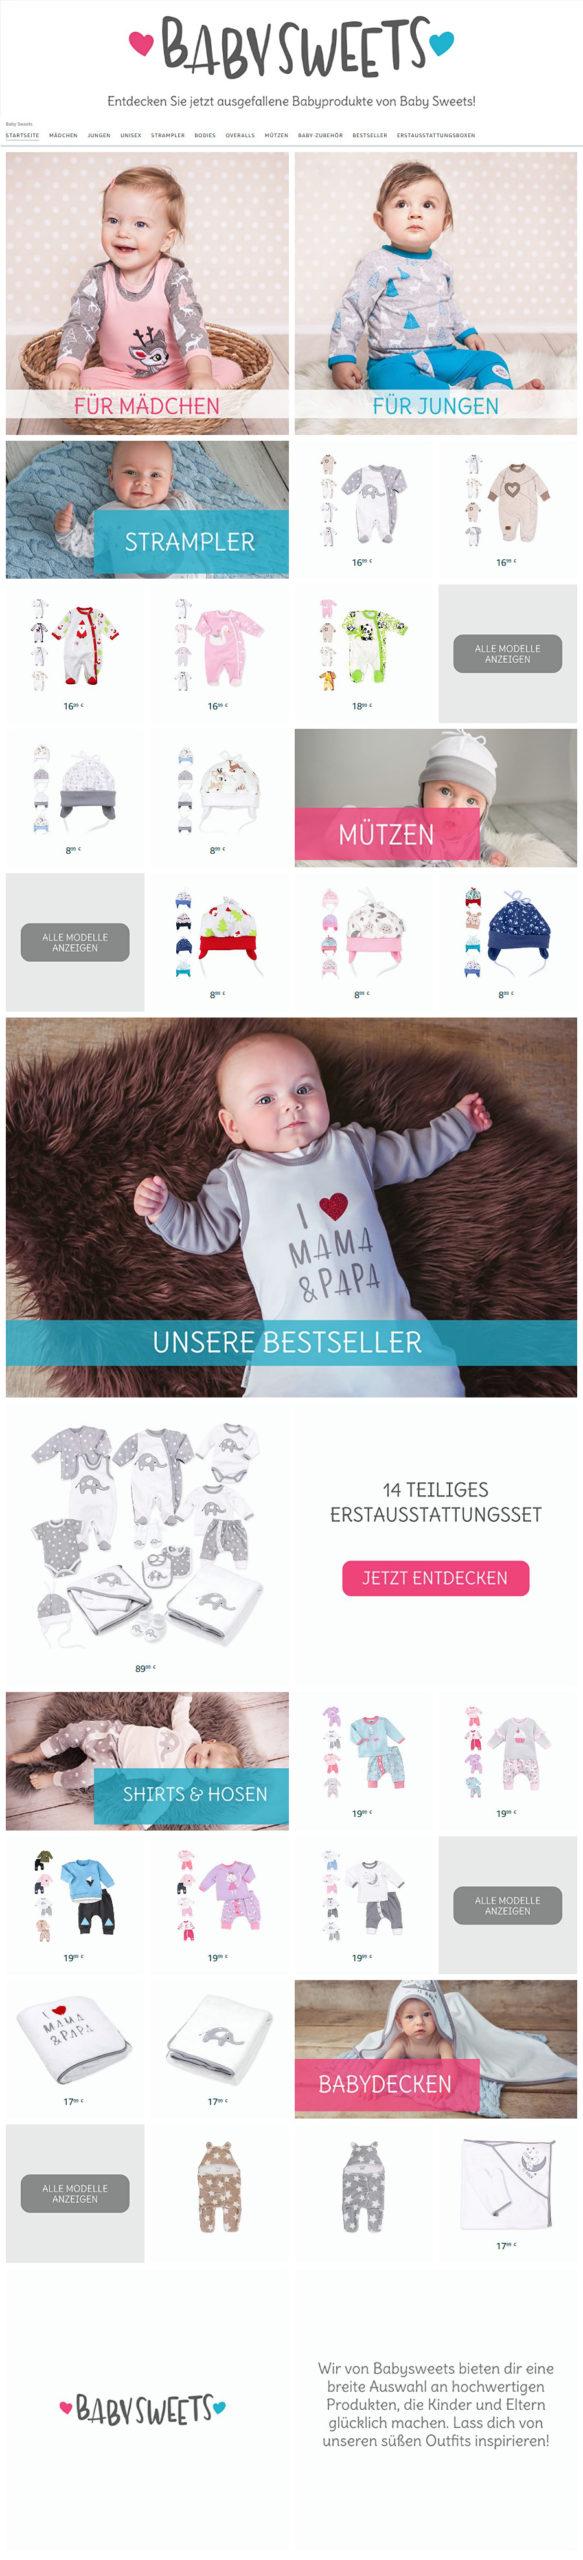 Brandstore Babysweets | Namox®